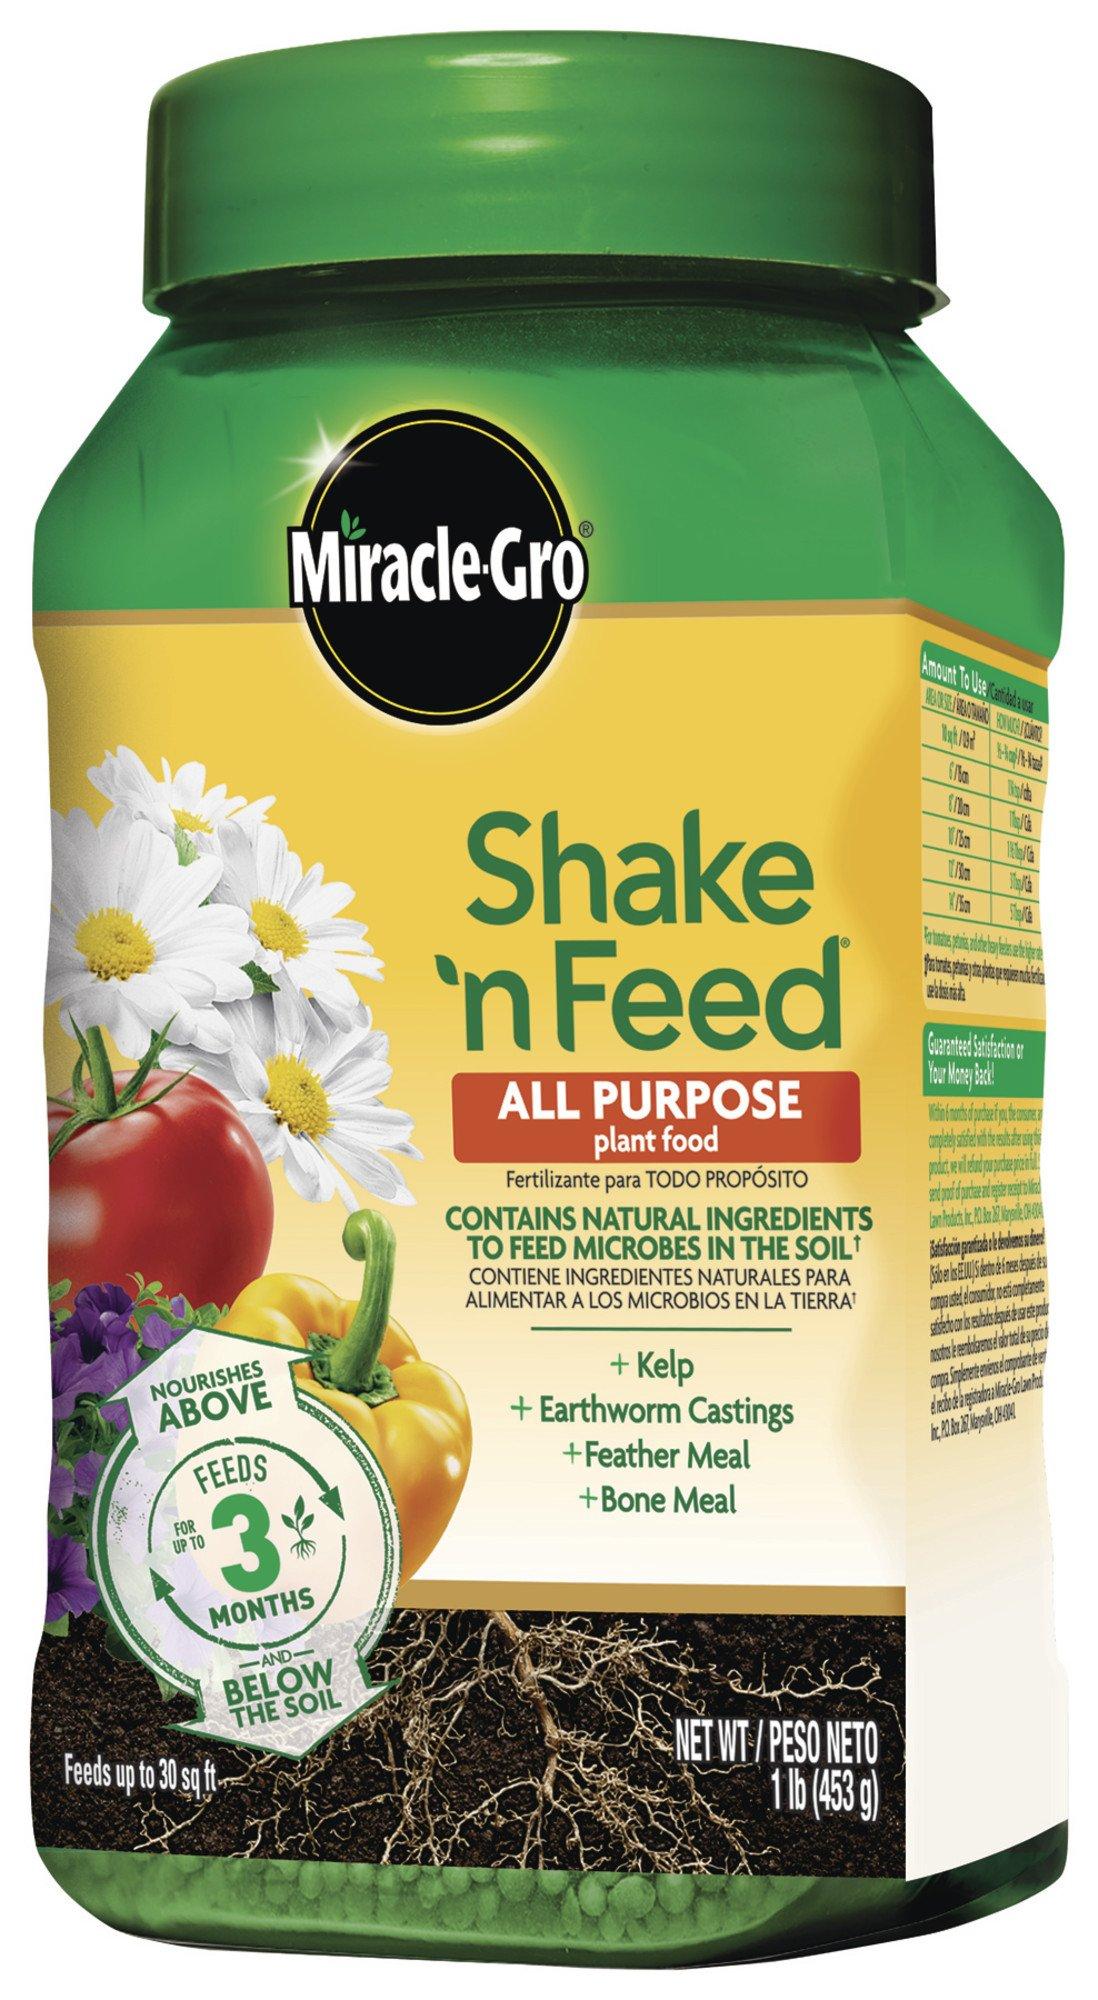 Miracle-Gro Shake N Feed All Purpose Plant Food, 1 lb.